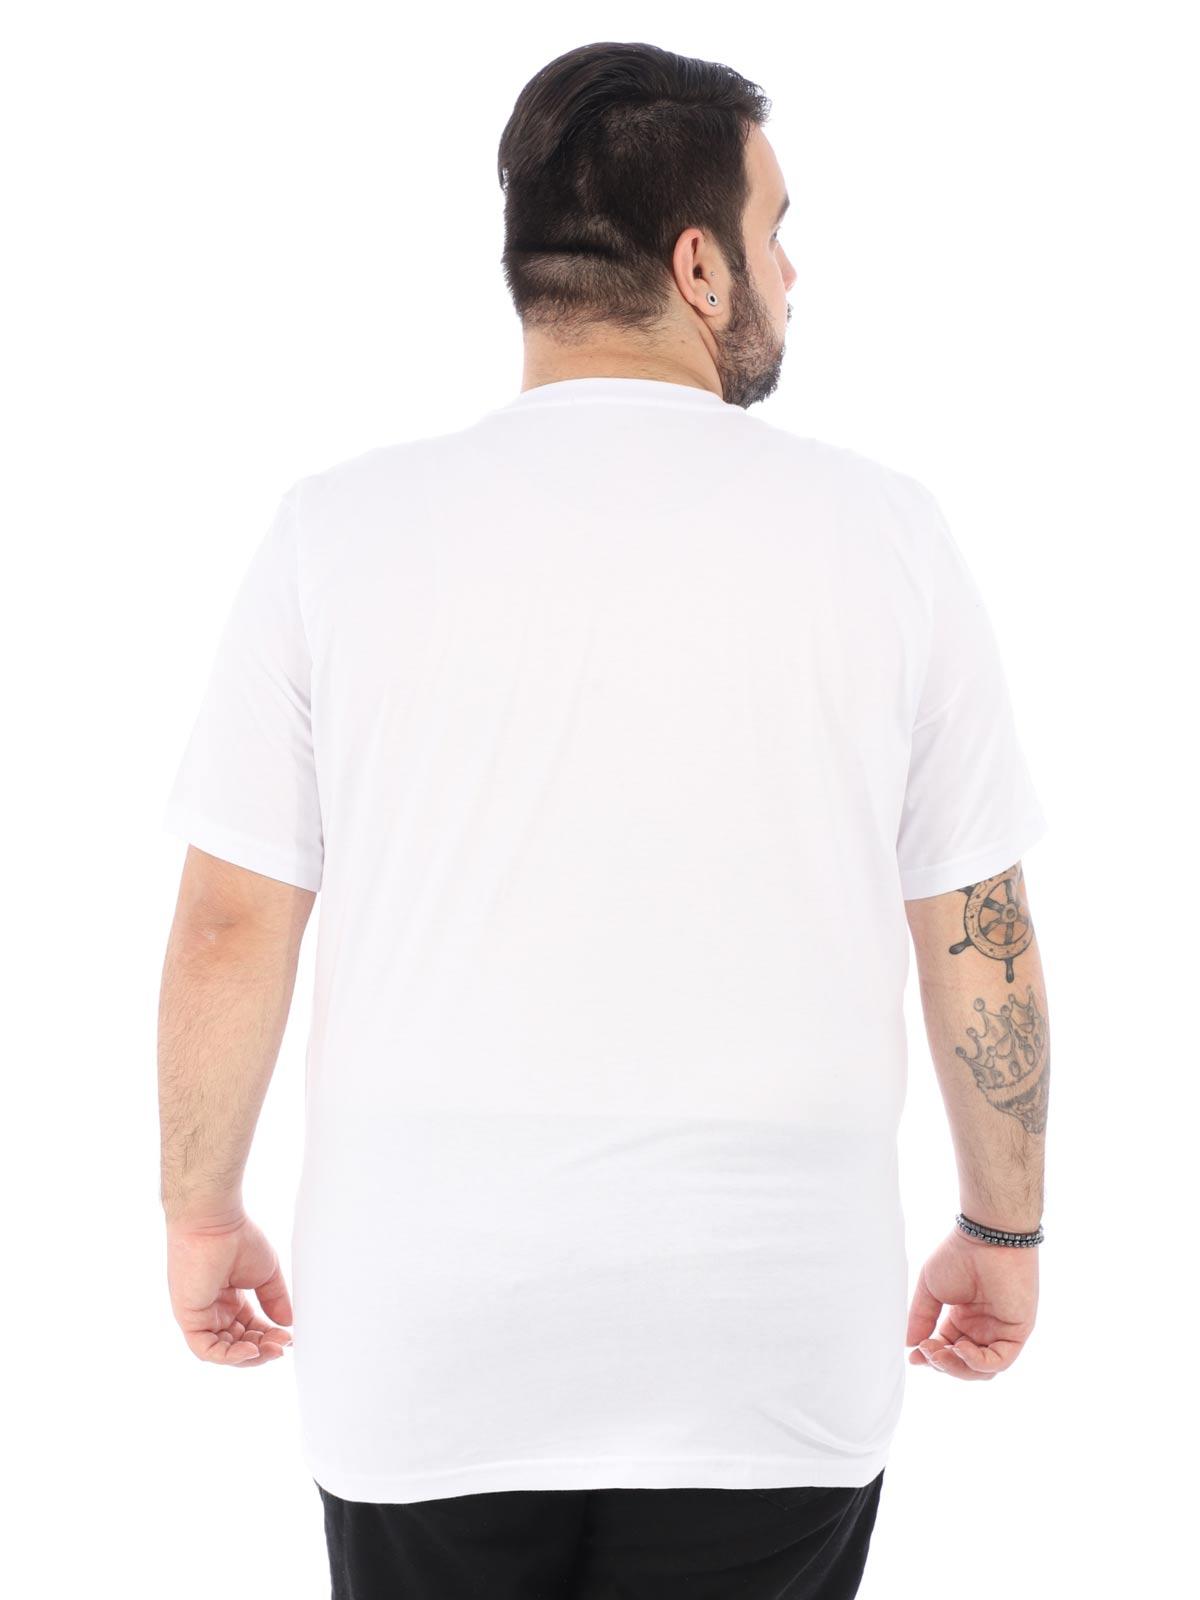 Camiseta Plus Size Masculina Manga Curta City Branca